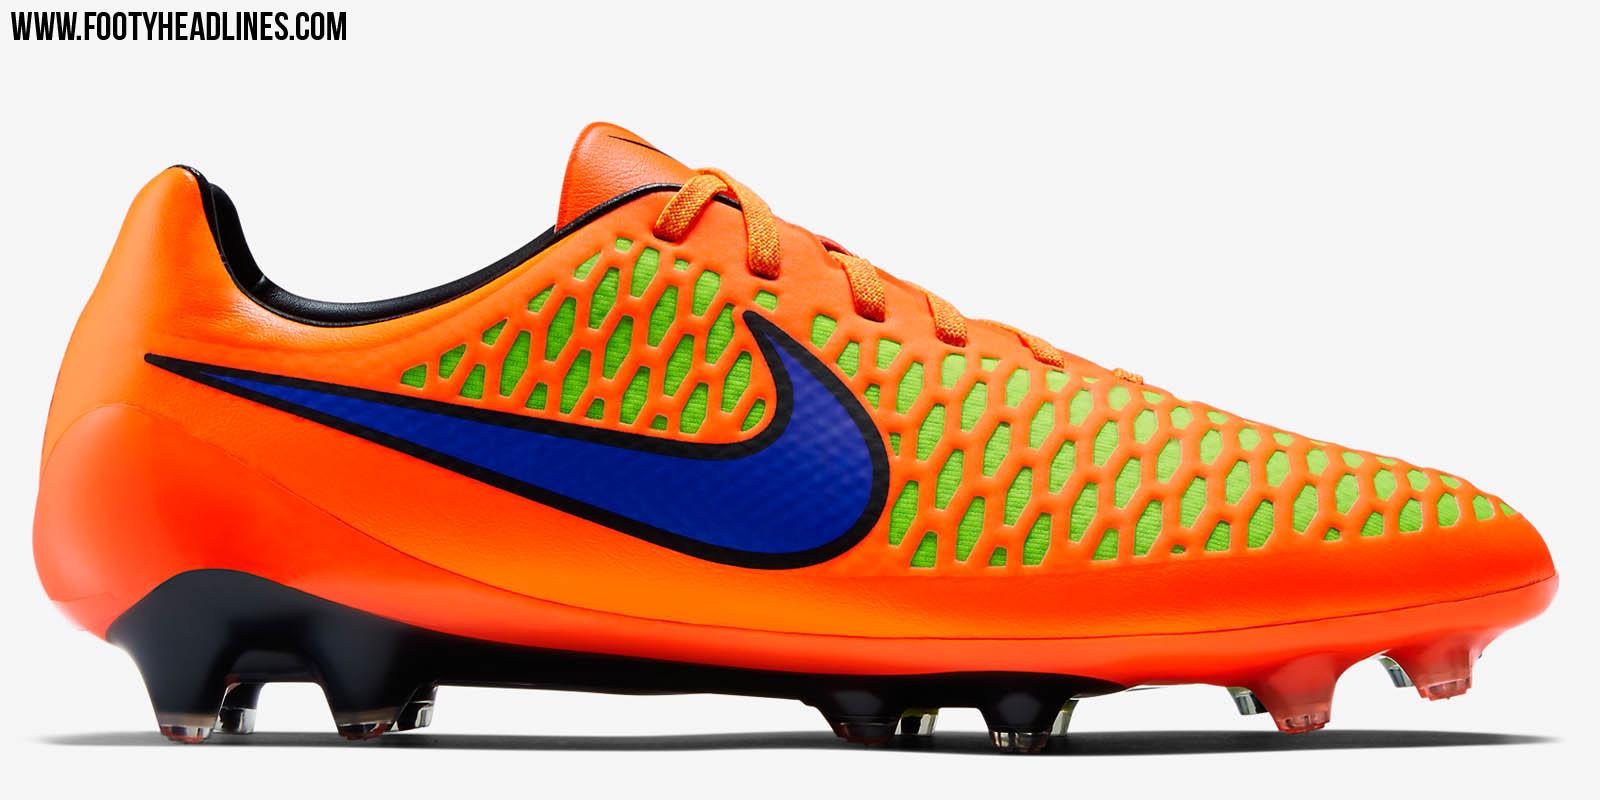 Nike magista opus intense heat pack 2015 cleat orange volt red purple